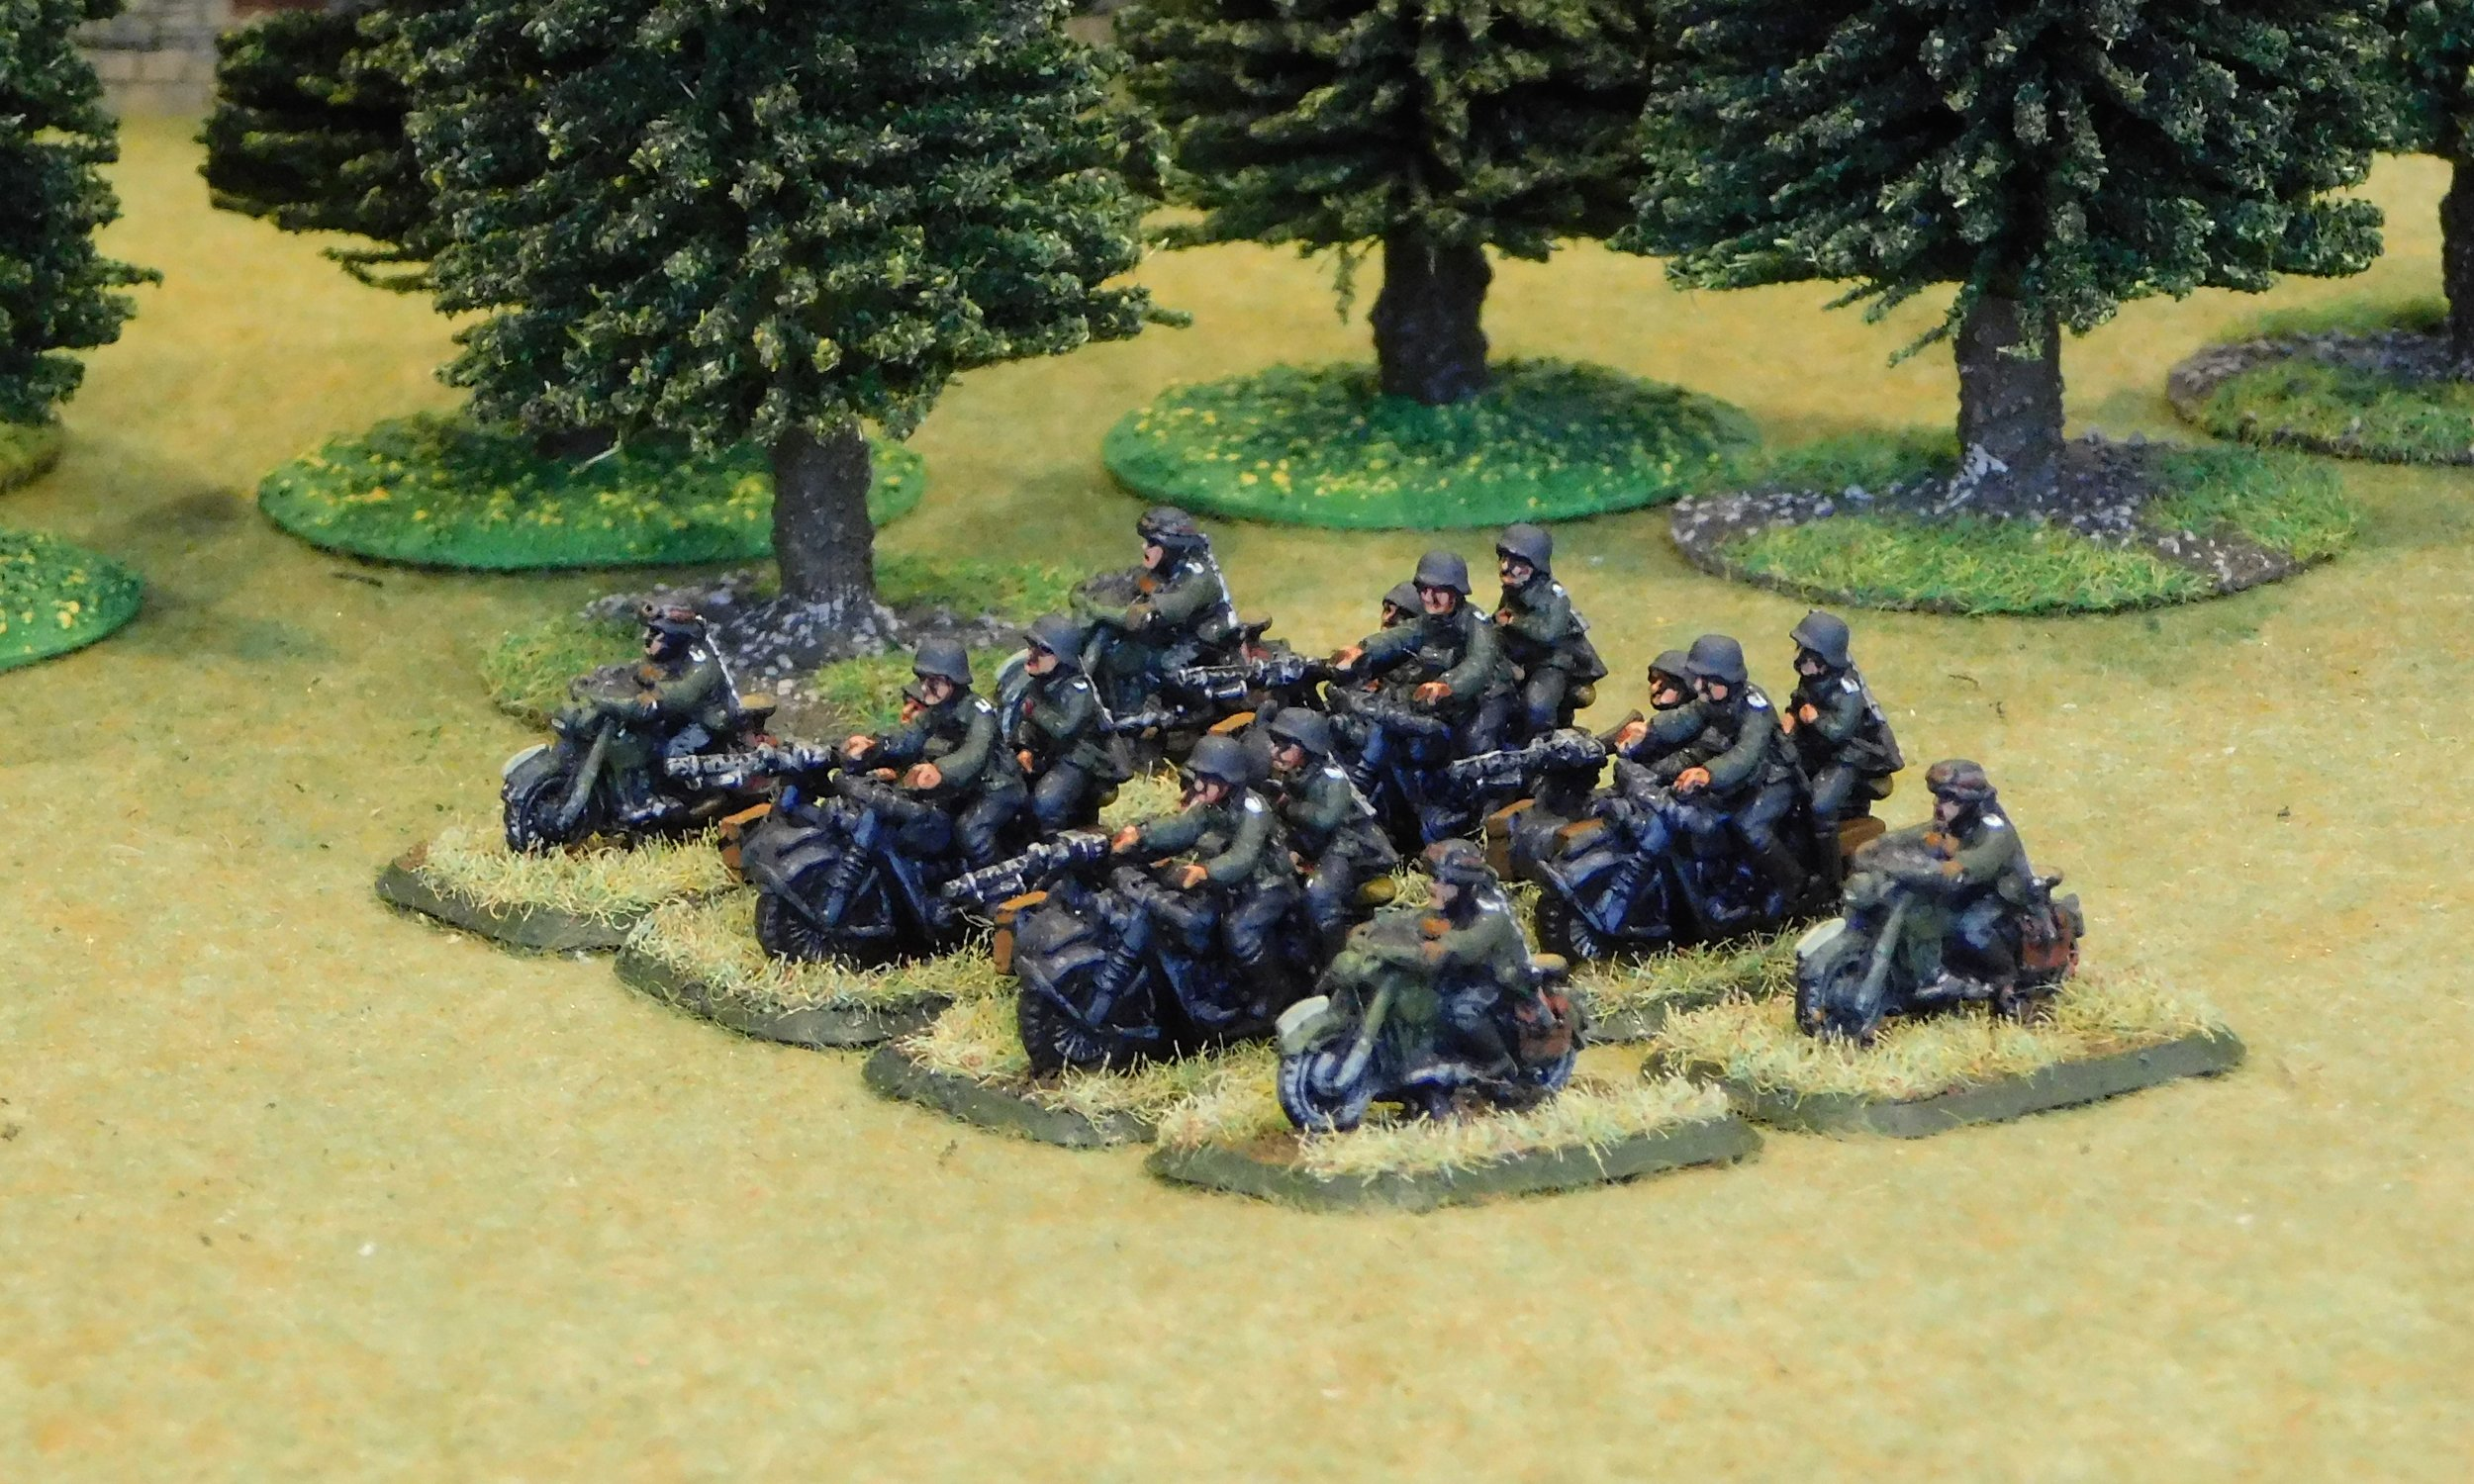 Infantry Motorcycle Platoon (remnants)